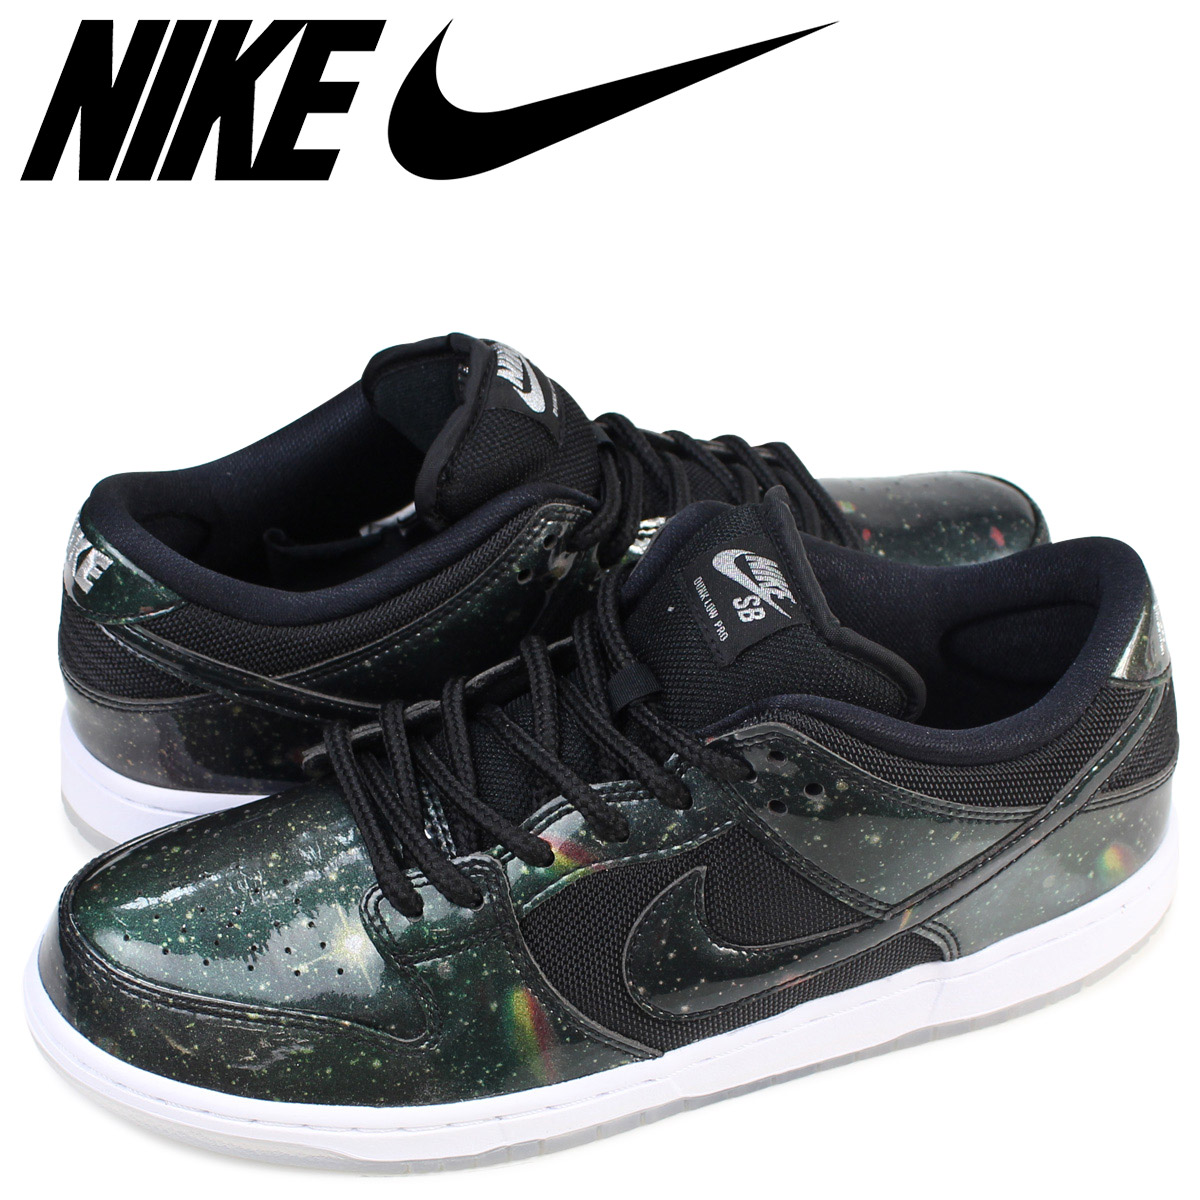 00e1dc44e5ed ALLSPORTS  NIKE Nike dunk SB sneakers DUNK LOW TRD QS GALAXY 883